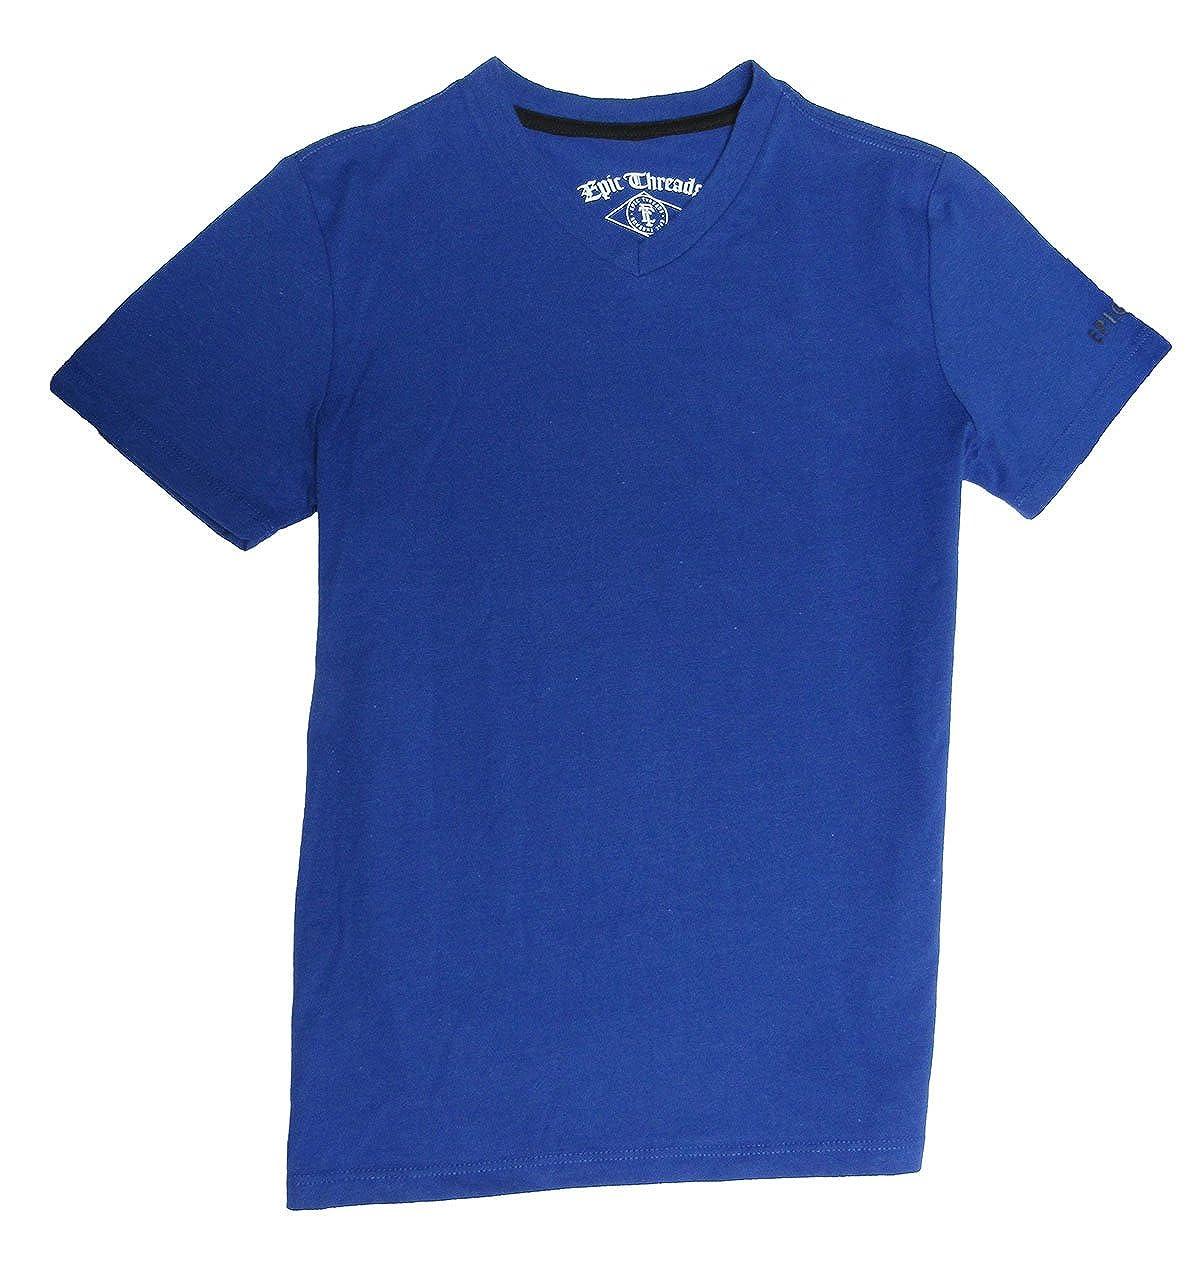 Epic Threads Boys V-Neck T-Shirt with logo on sleeve Lazulite